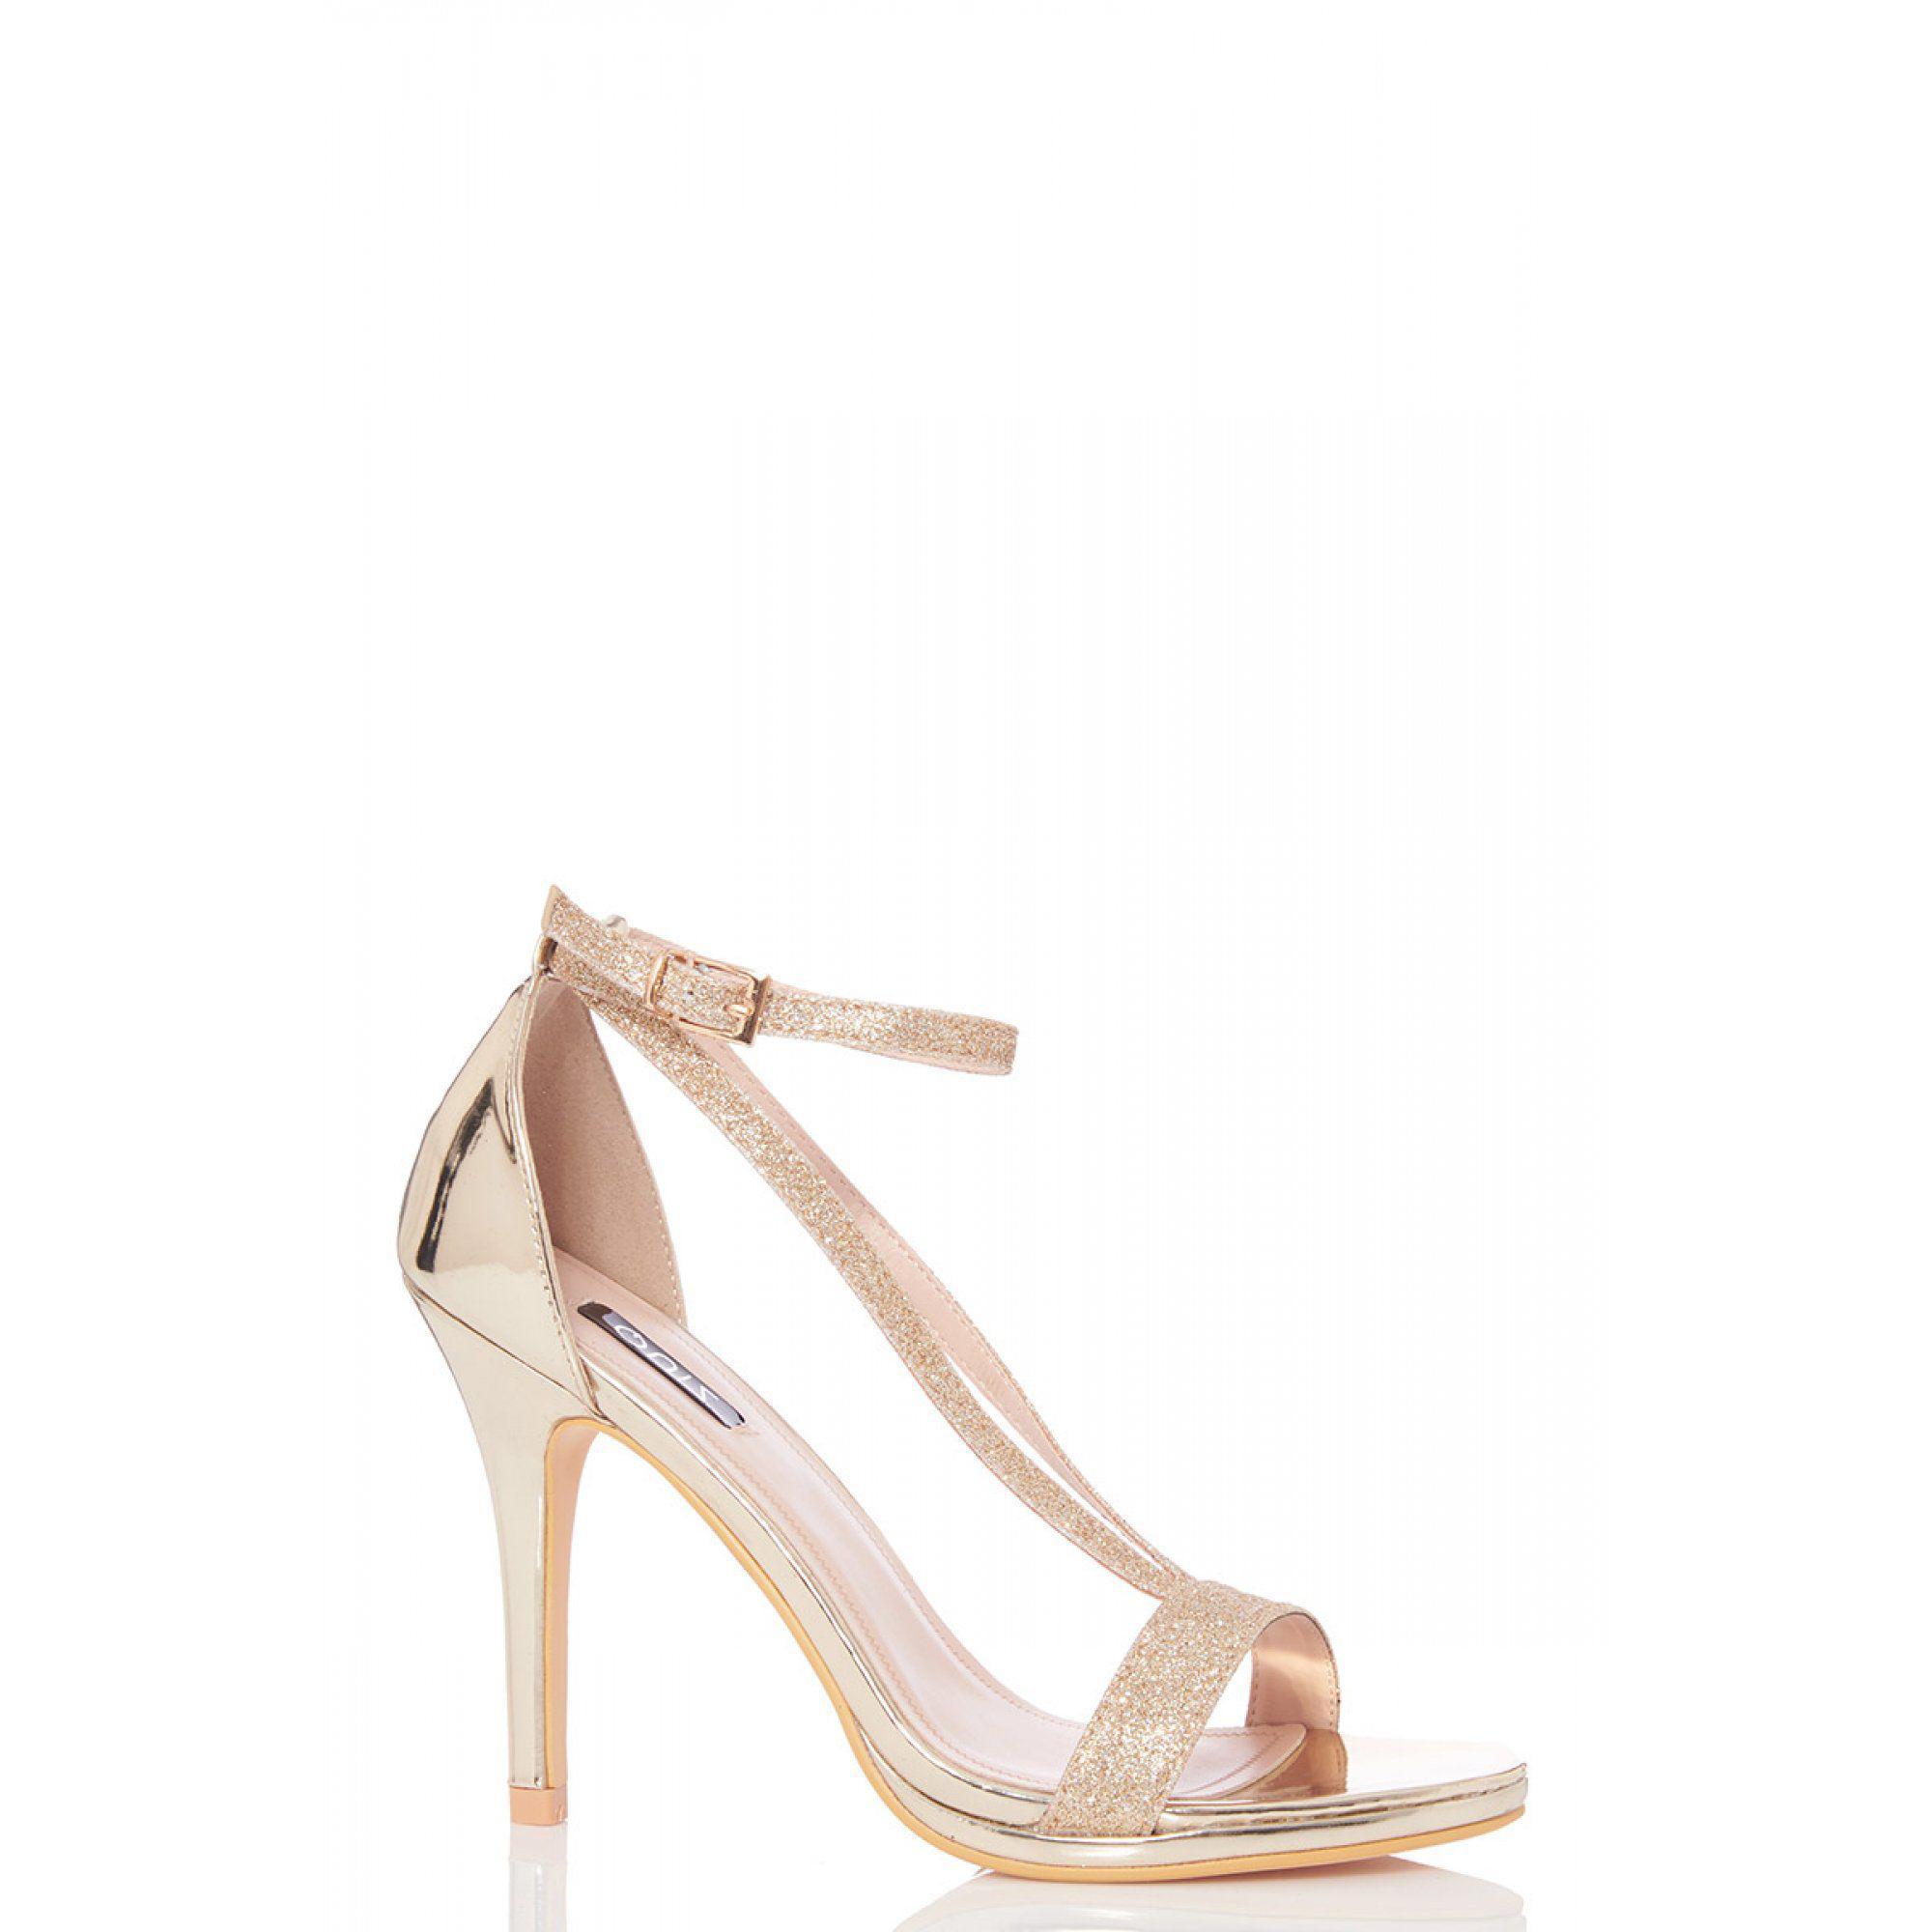 0af177e100d Quiz Gold Glitter Strap Heel Sandals in Metallic - Lyst